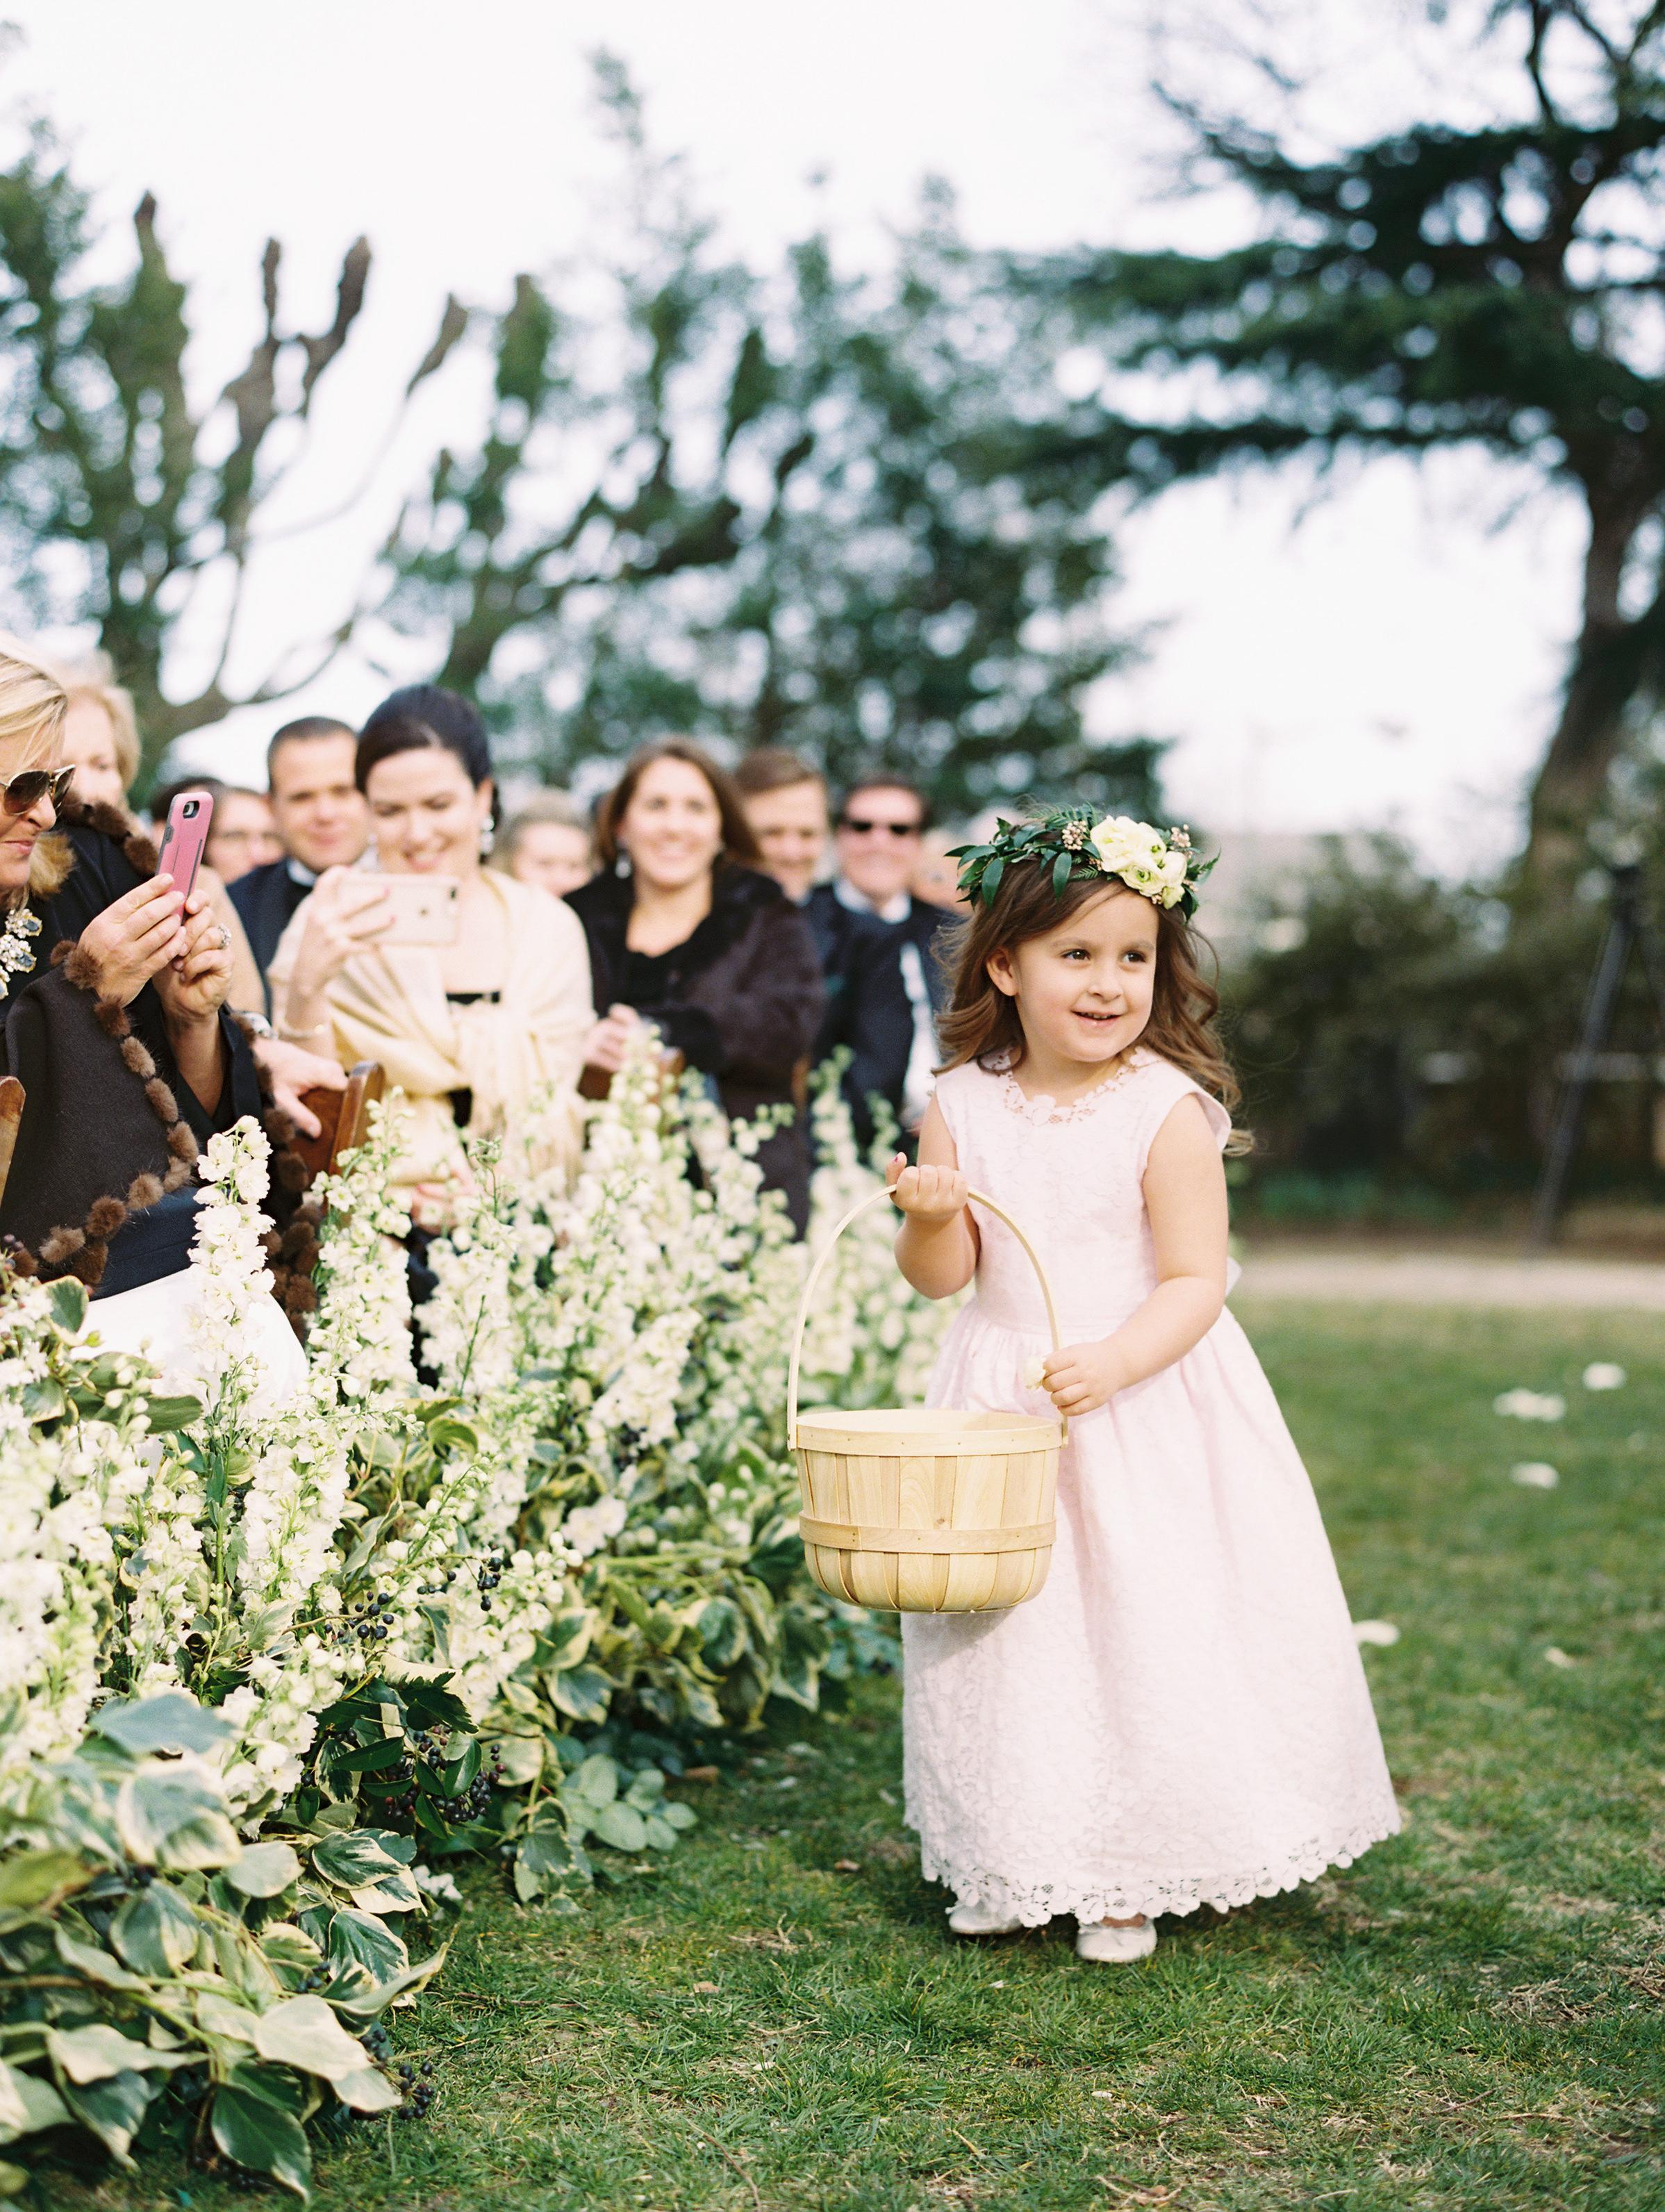 The Best Flower Girl Dresses For A Summer Wedding Martha Stewart